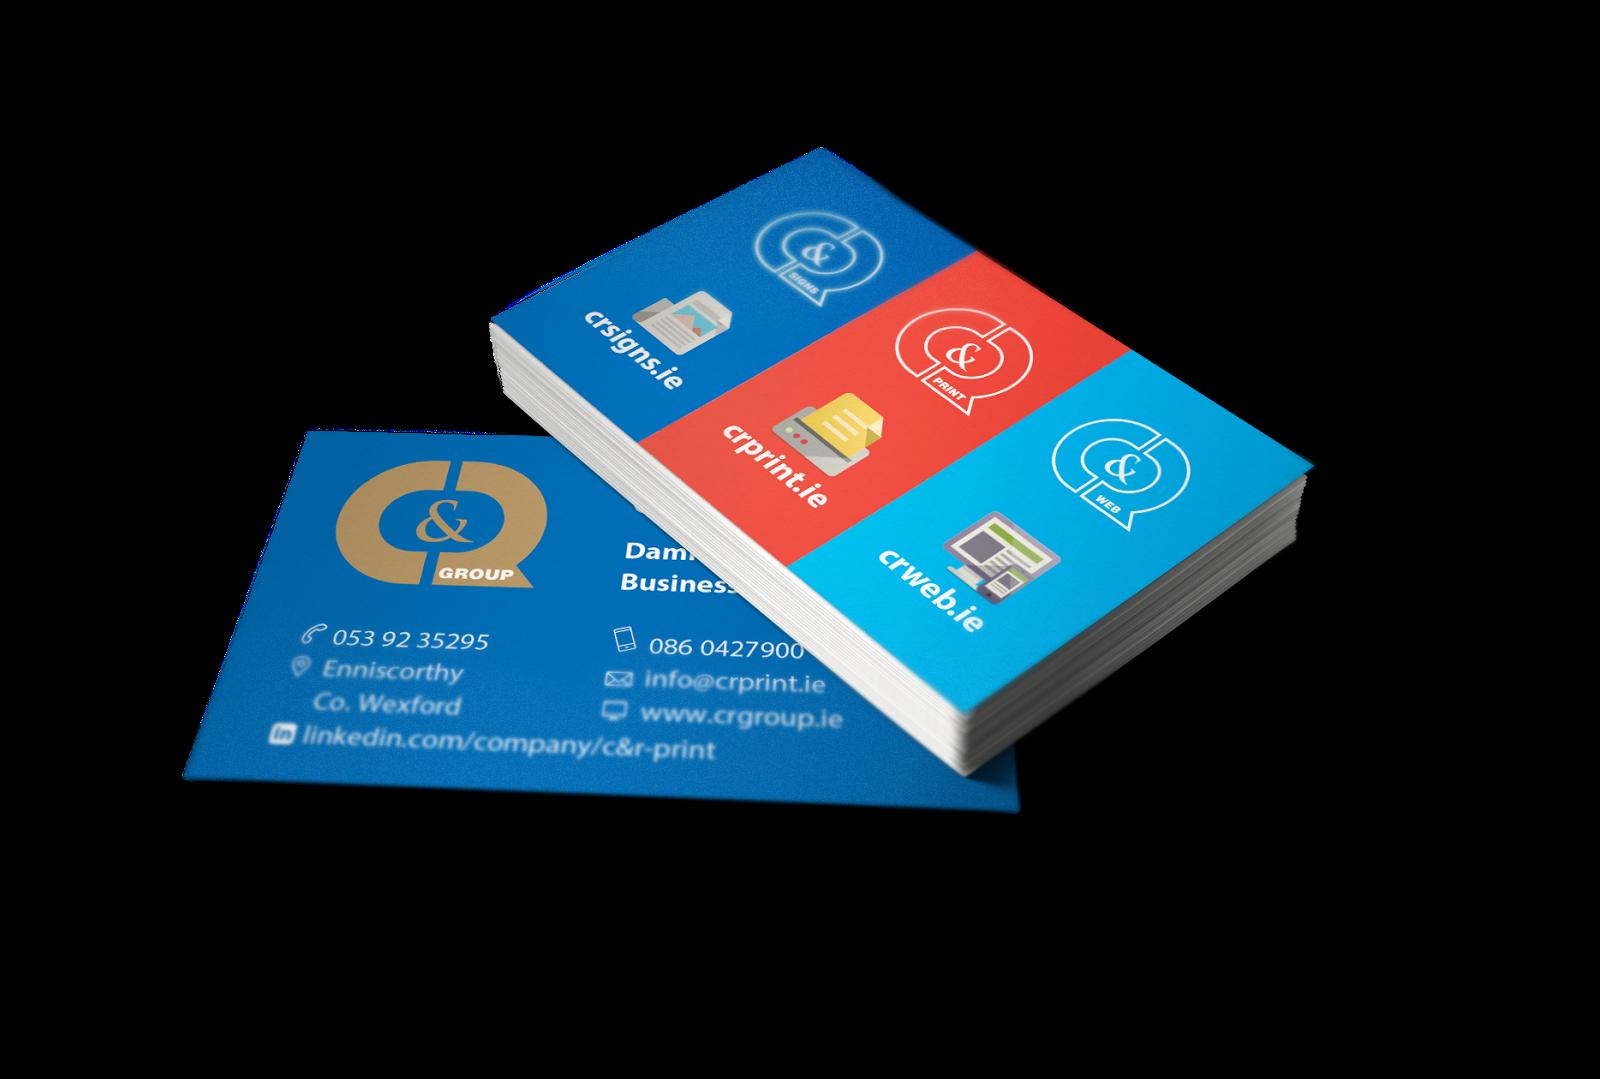 Custom Business Cards Shutterfly - oukas.info